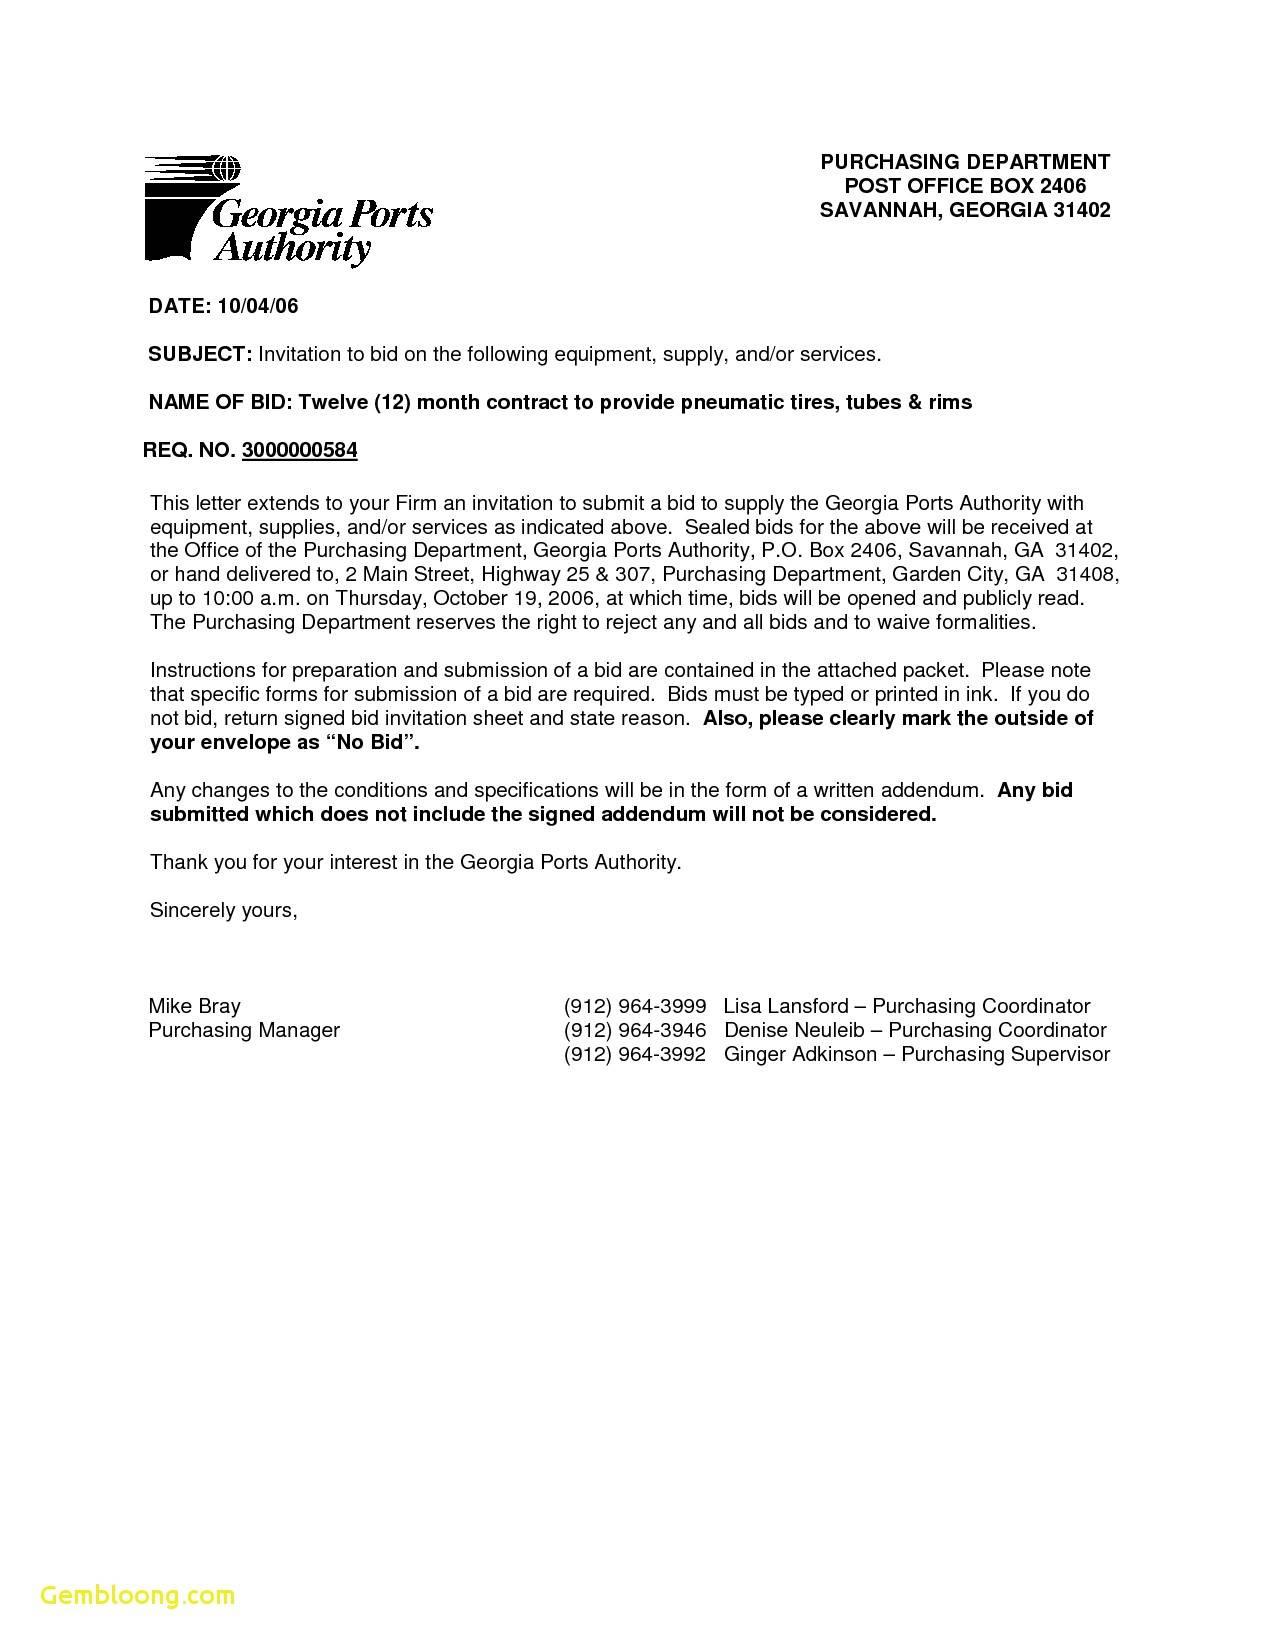 Rfp Response Template Construction